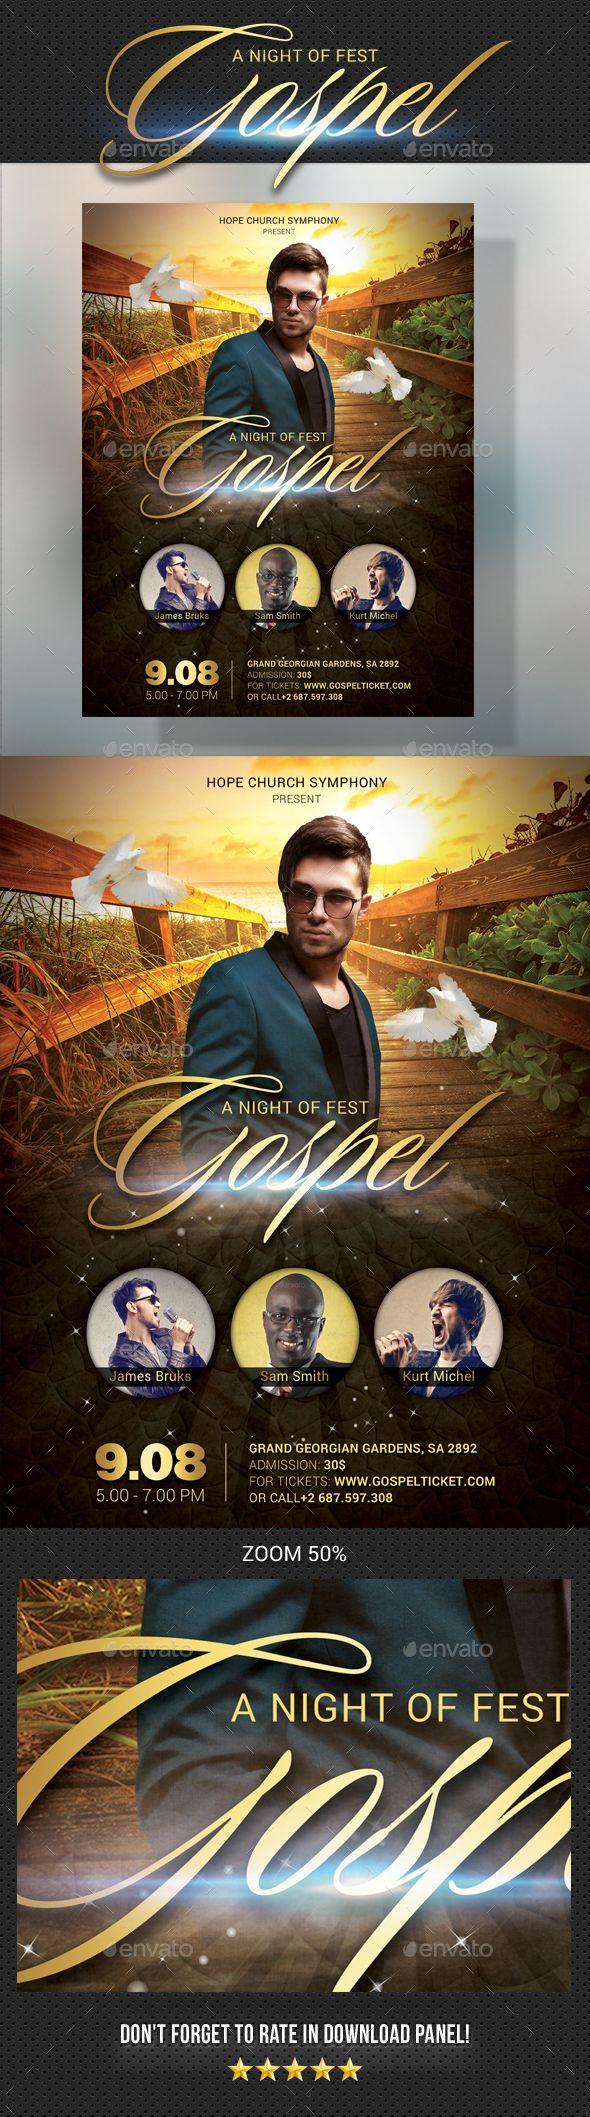 Gospel Flyer Flyer Design Templates Template And Flyer Template